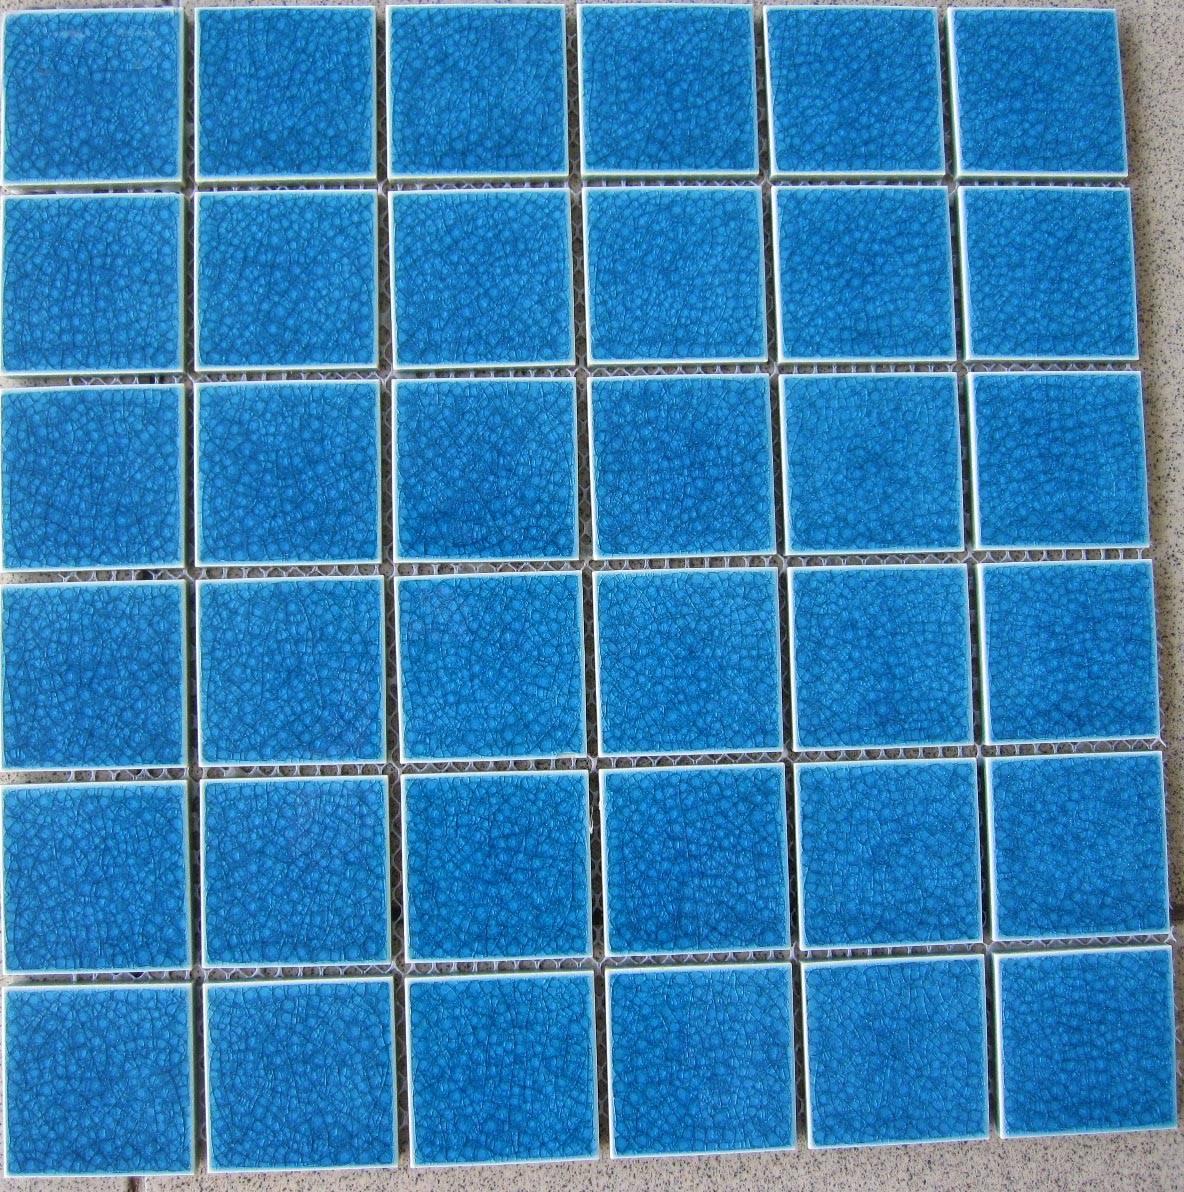 48X48MM Crackle Glazed Dark Blue Swimming pool tiles